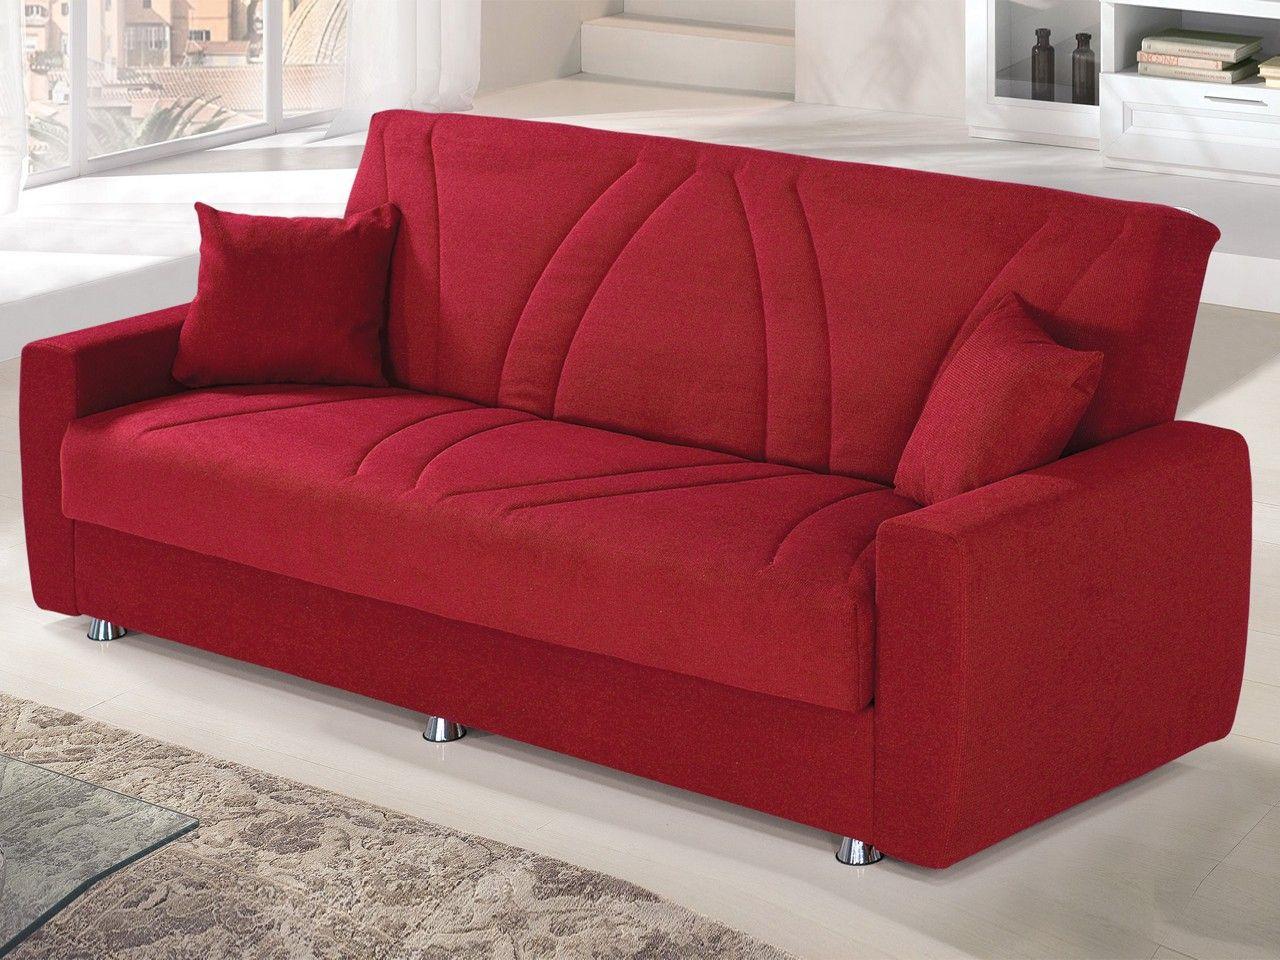 Cool Sofas Camas , Lovely Sofas Camas 17 For Sofa Room Ideas With Sofas  Camas ,